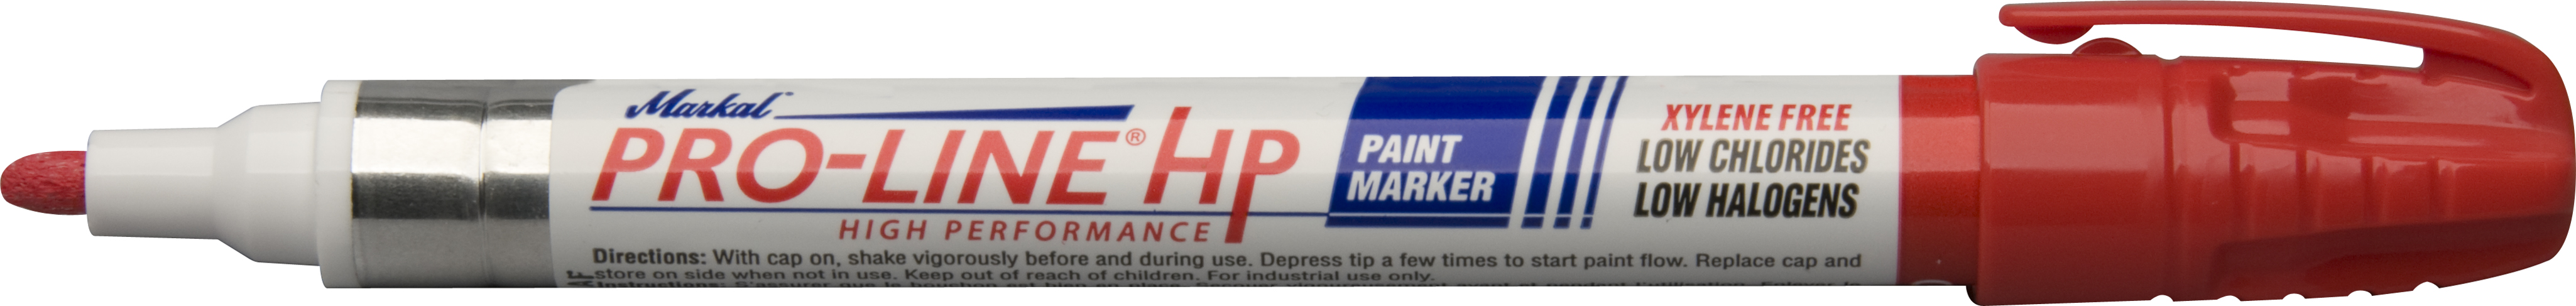 Markal Pro Line HP Paint Marker - Black